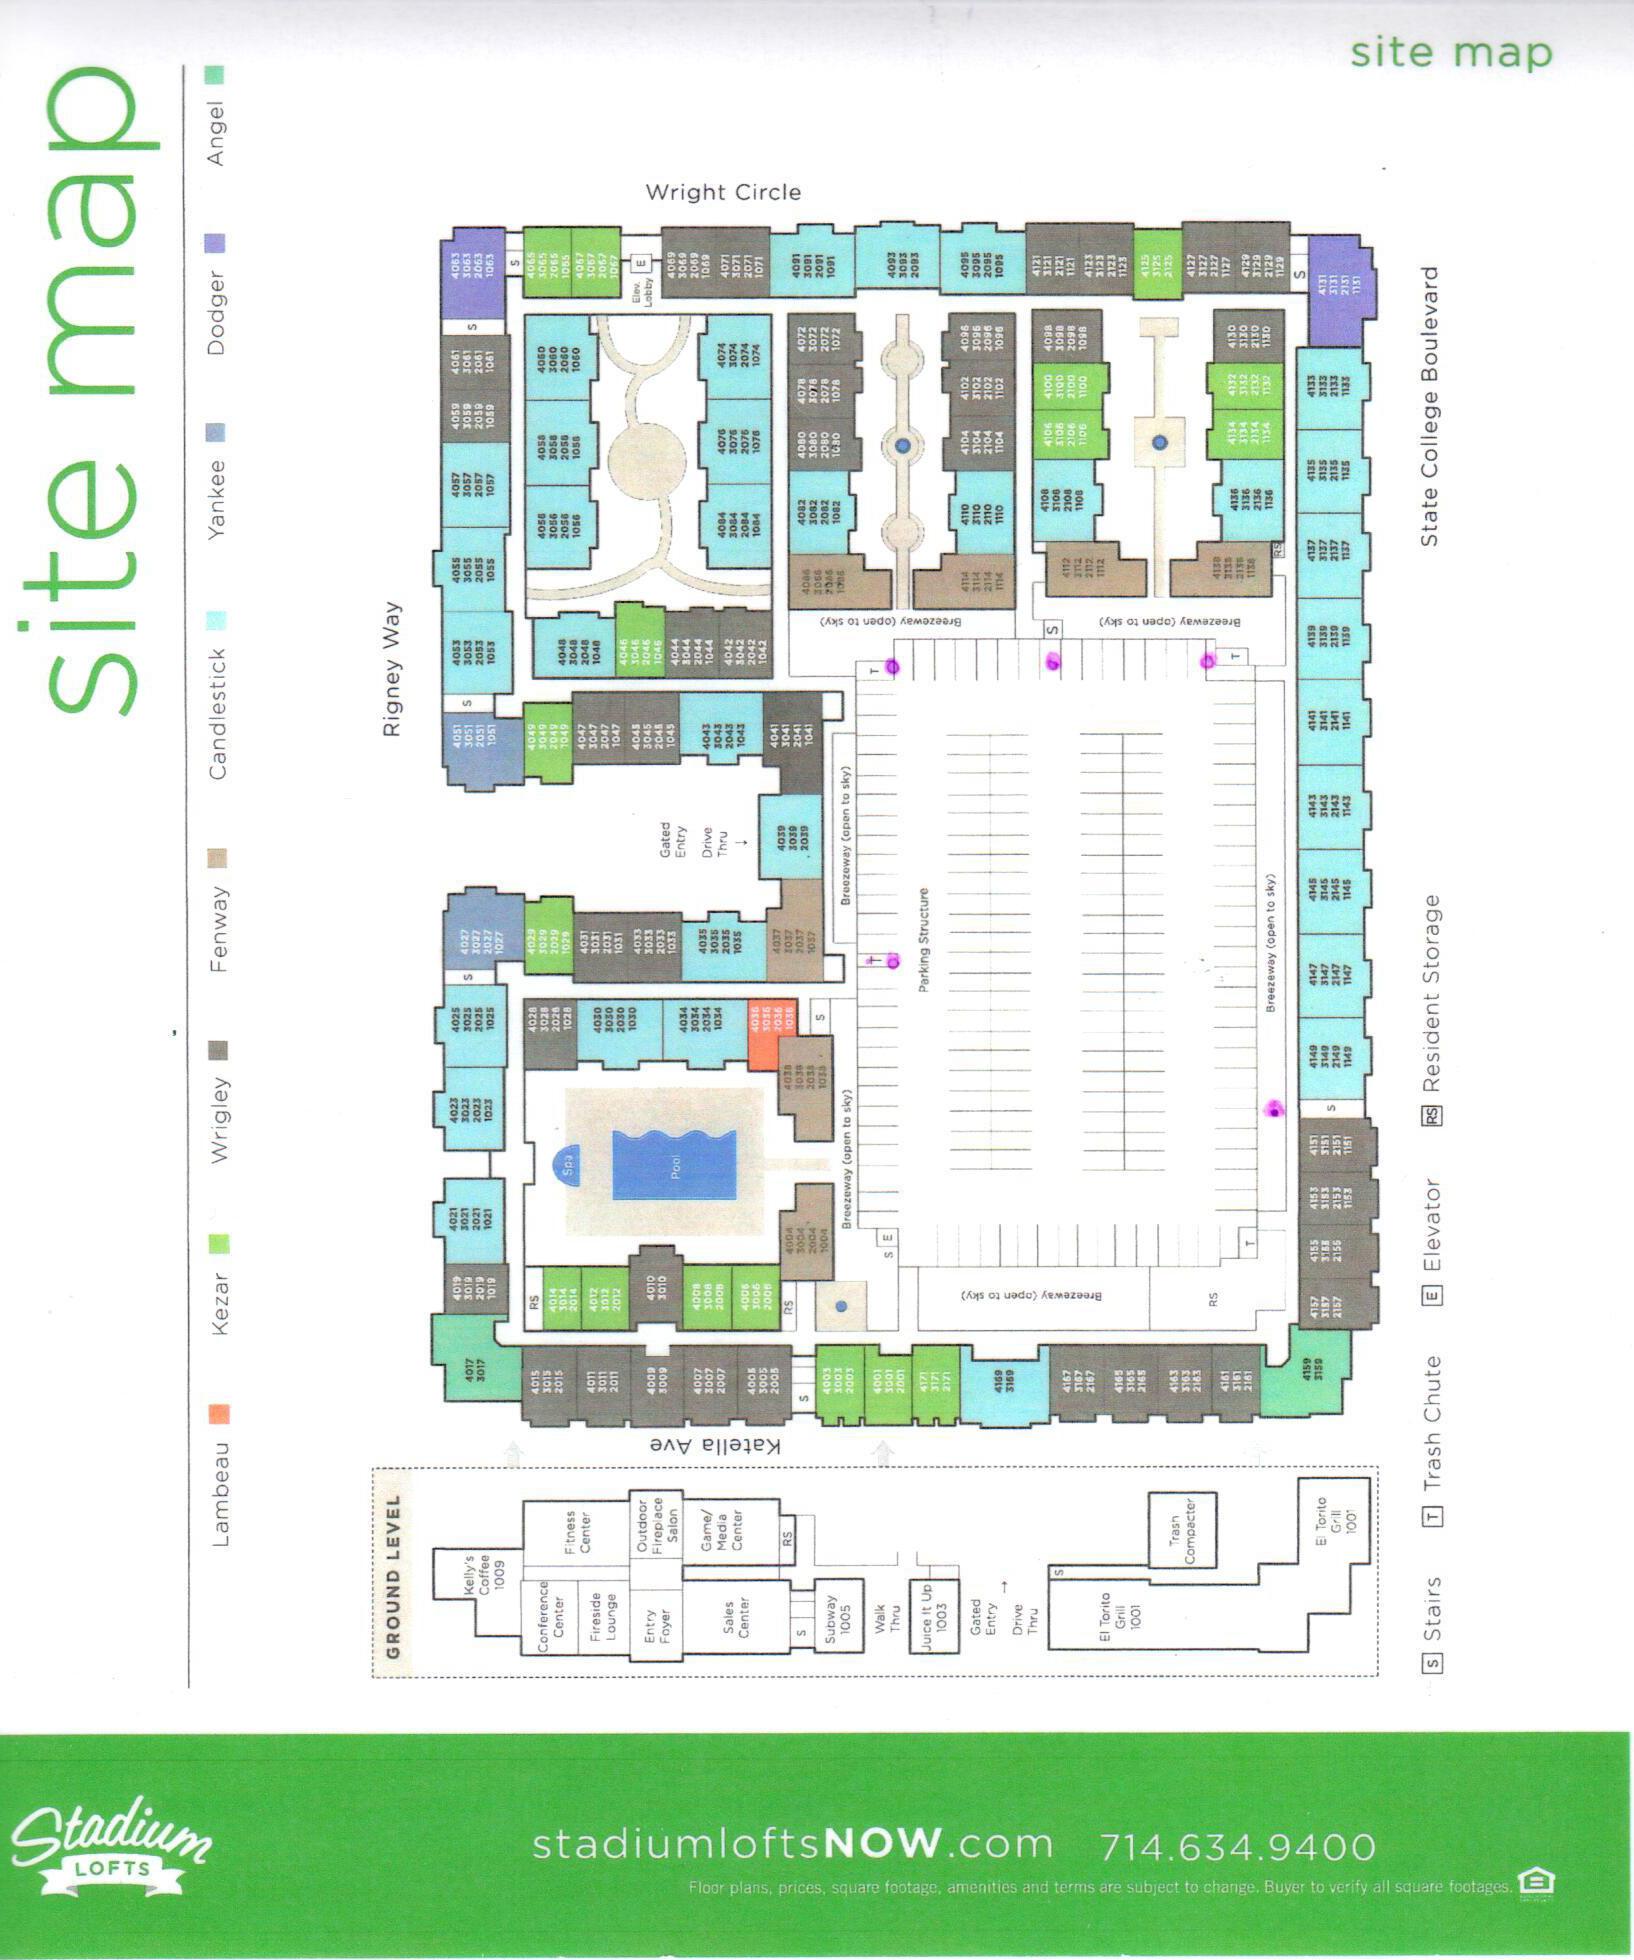 SLCA Site Map - Color - 7.5.17.jpg